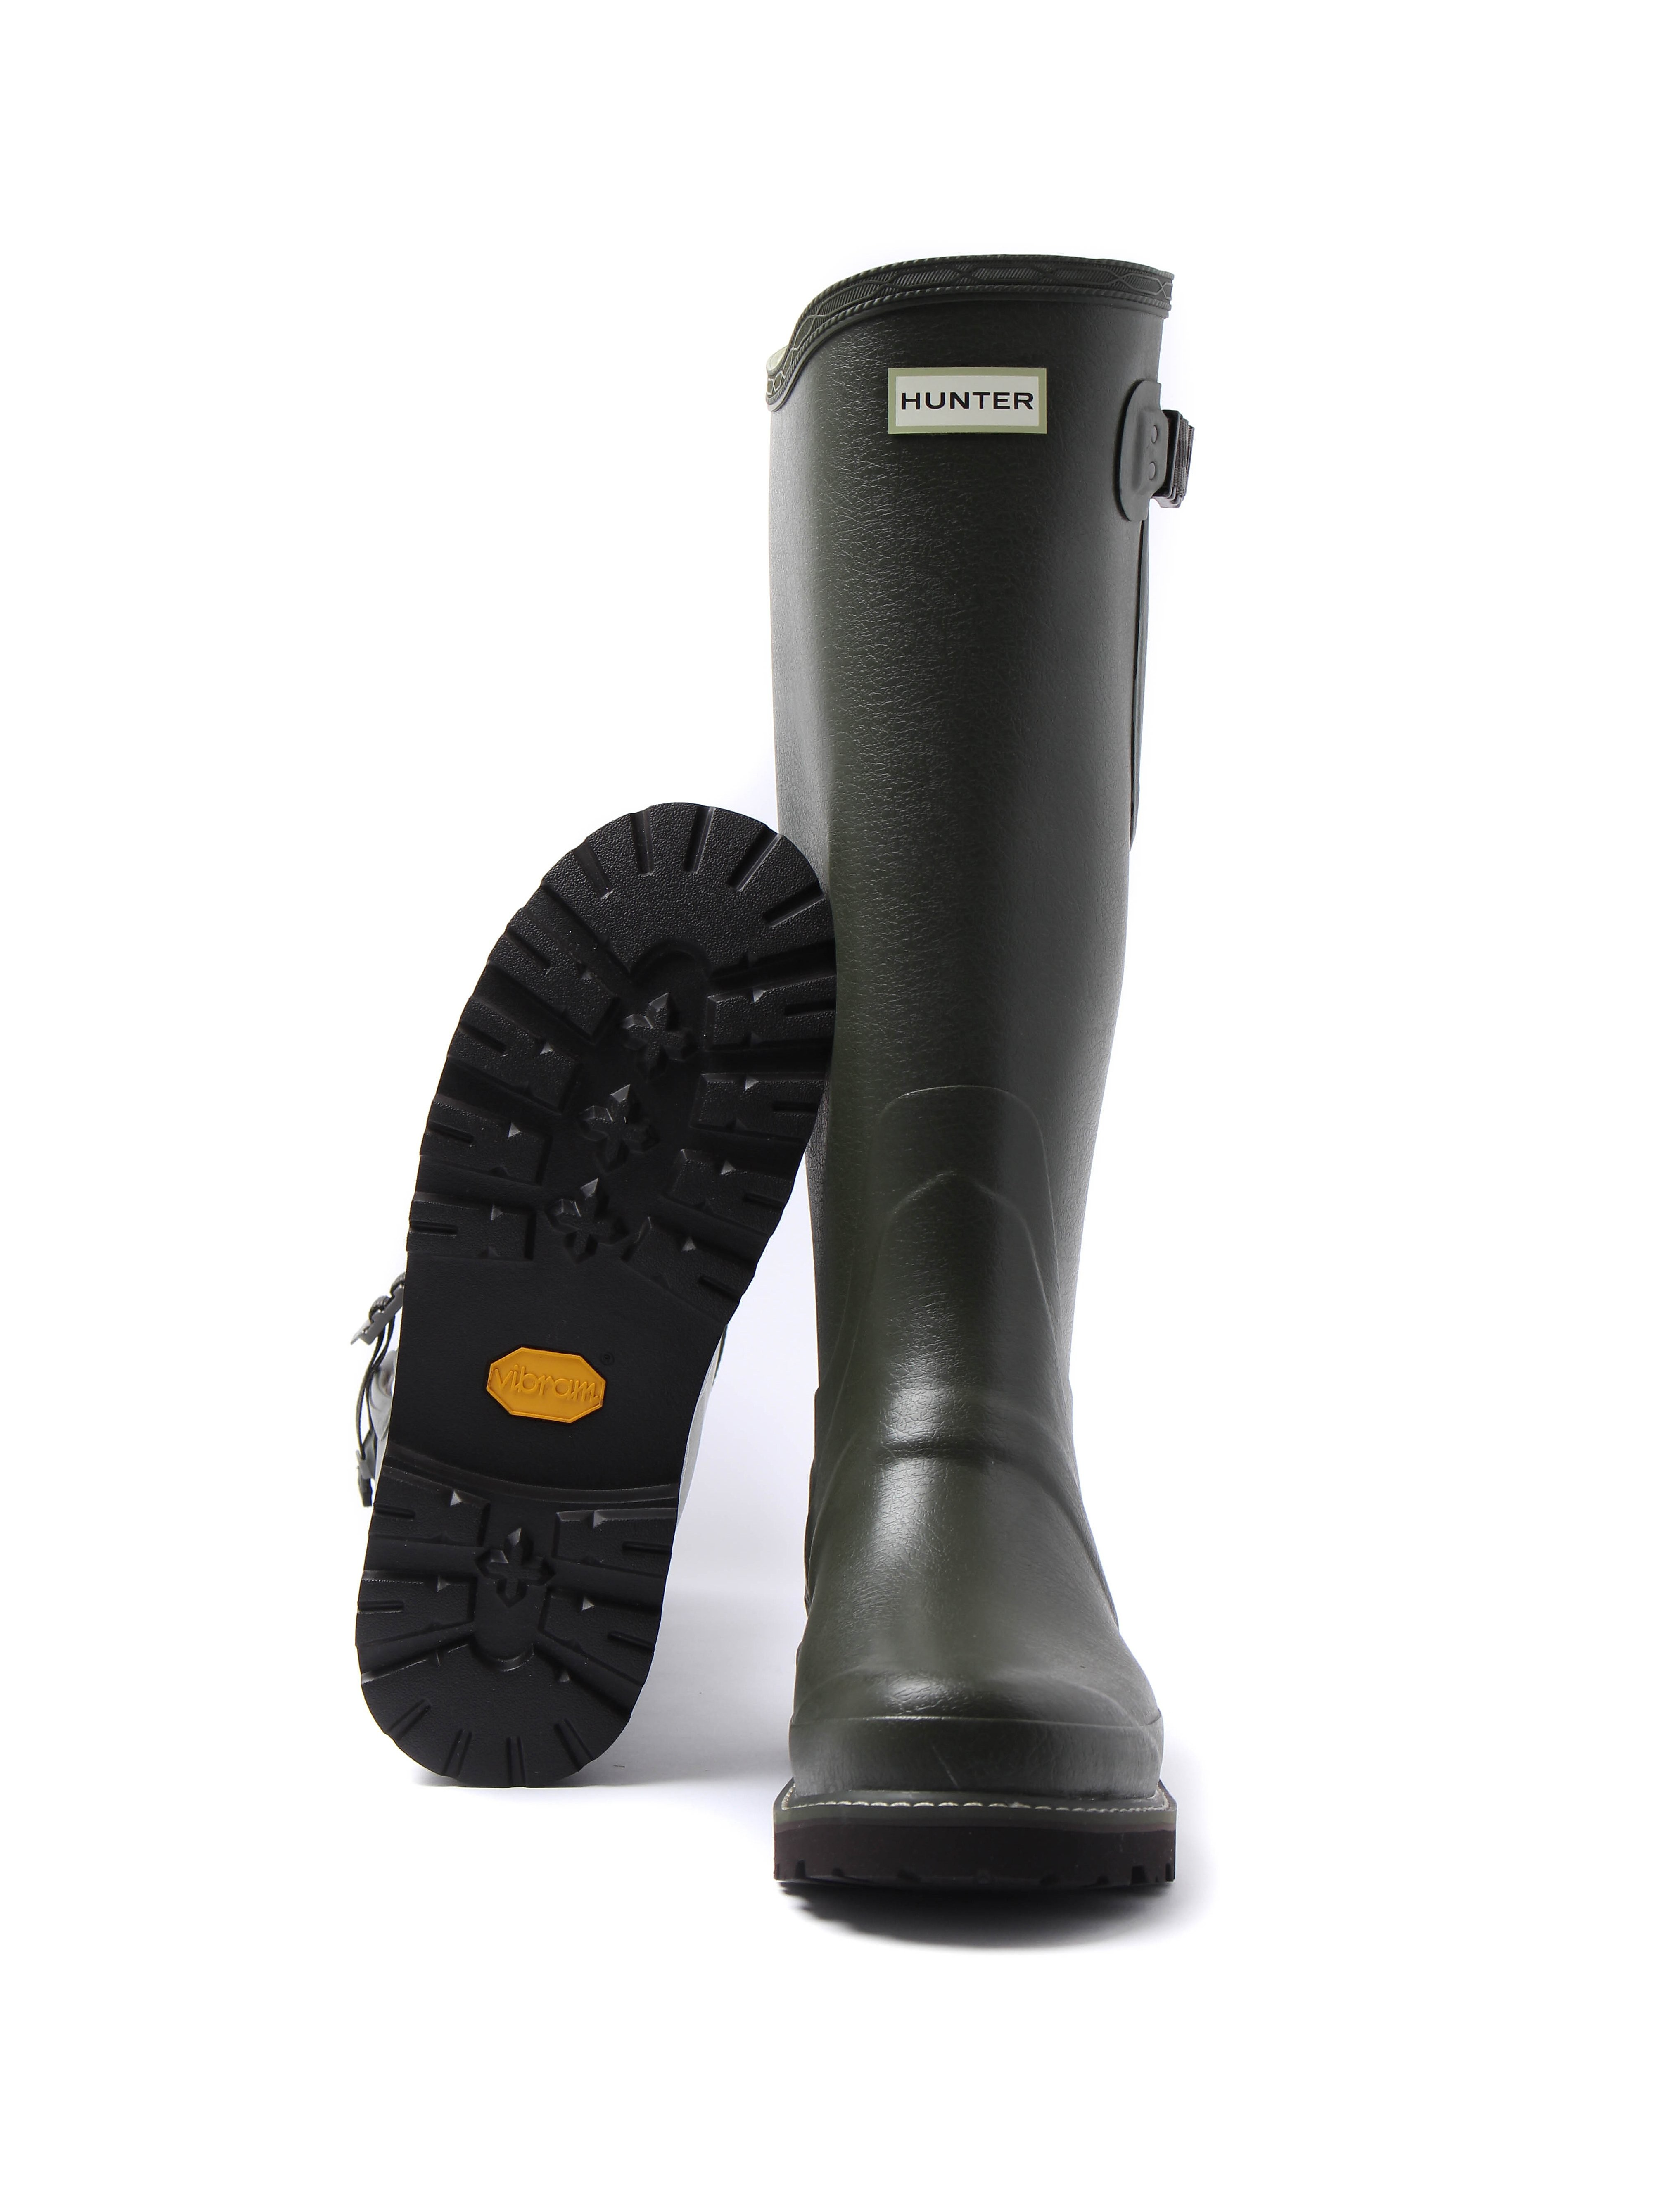 Hunter Wellies Men's Balmoral Sovereign Side Adjustable Wellington Boots - Dark Olive